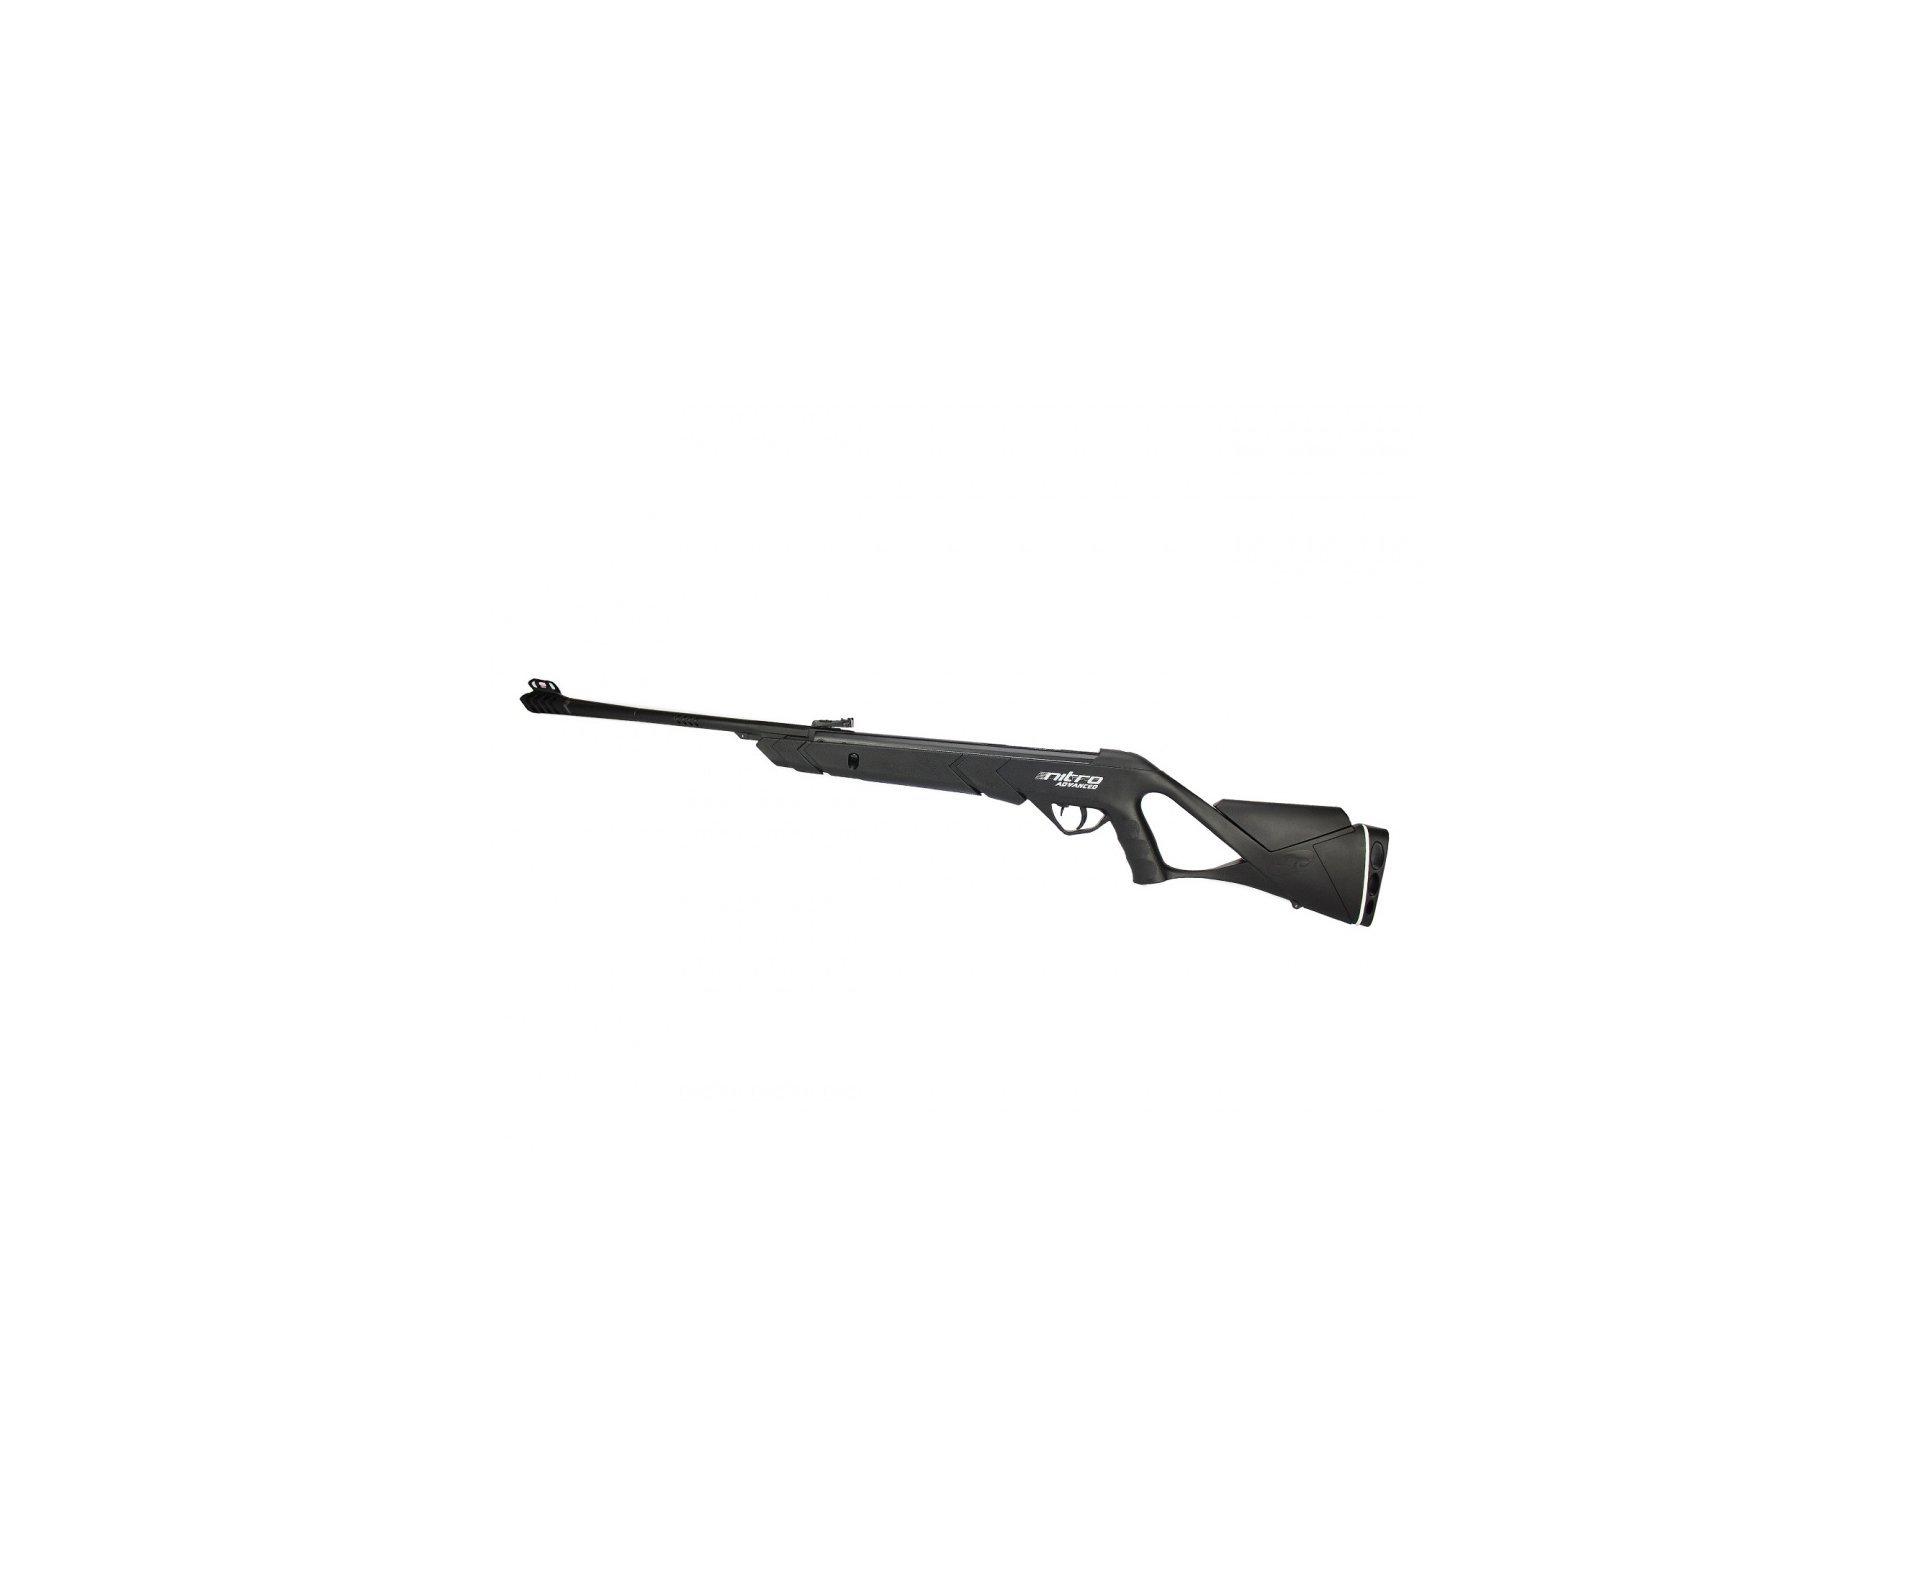 Carabina De Pressão Advanced Nitro F22 Cbc 5.5 + Case Plano + Chumbinhos